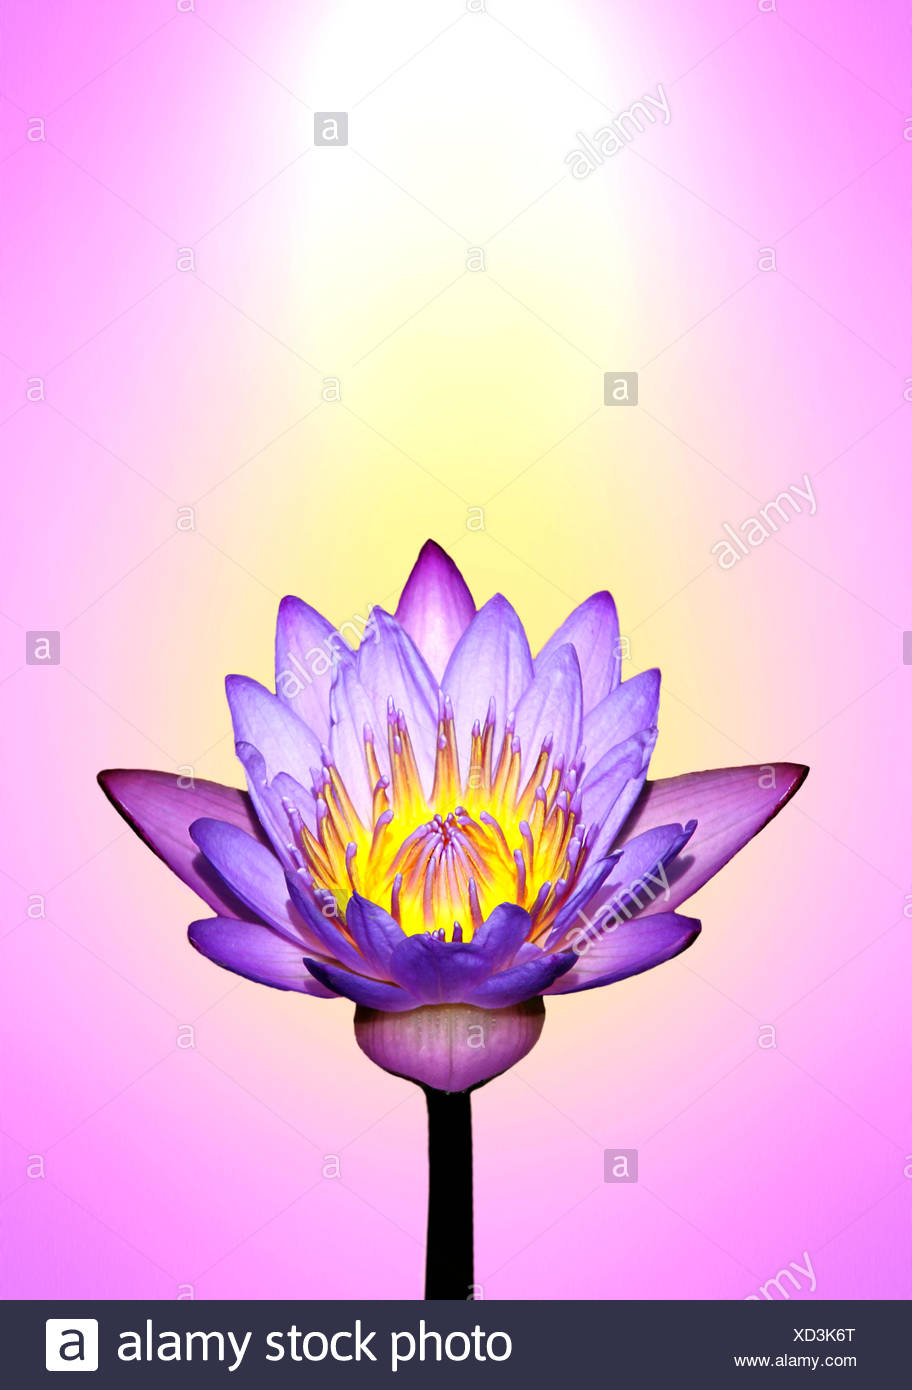 Lotus flower colours gallery flower decoration ideas field of lotus plants stock photos field of lotus plants stock lotus flower with energy colours izmirmasajfo